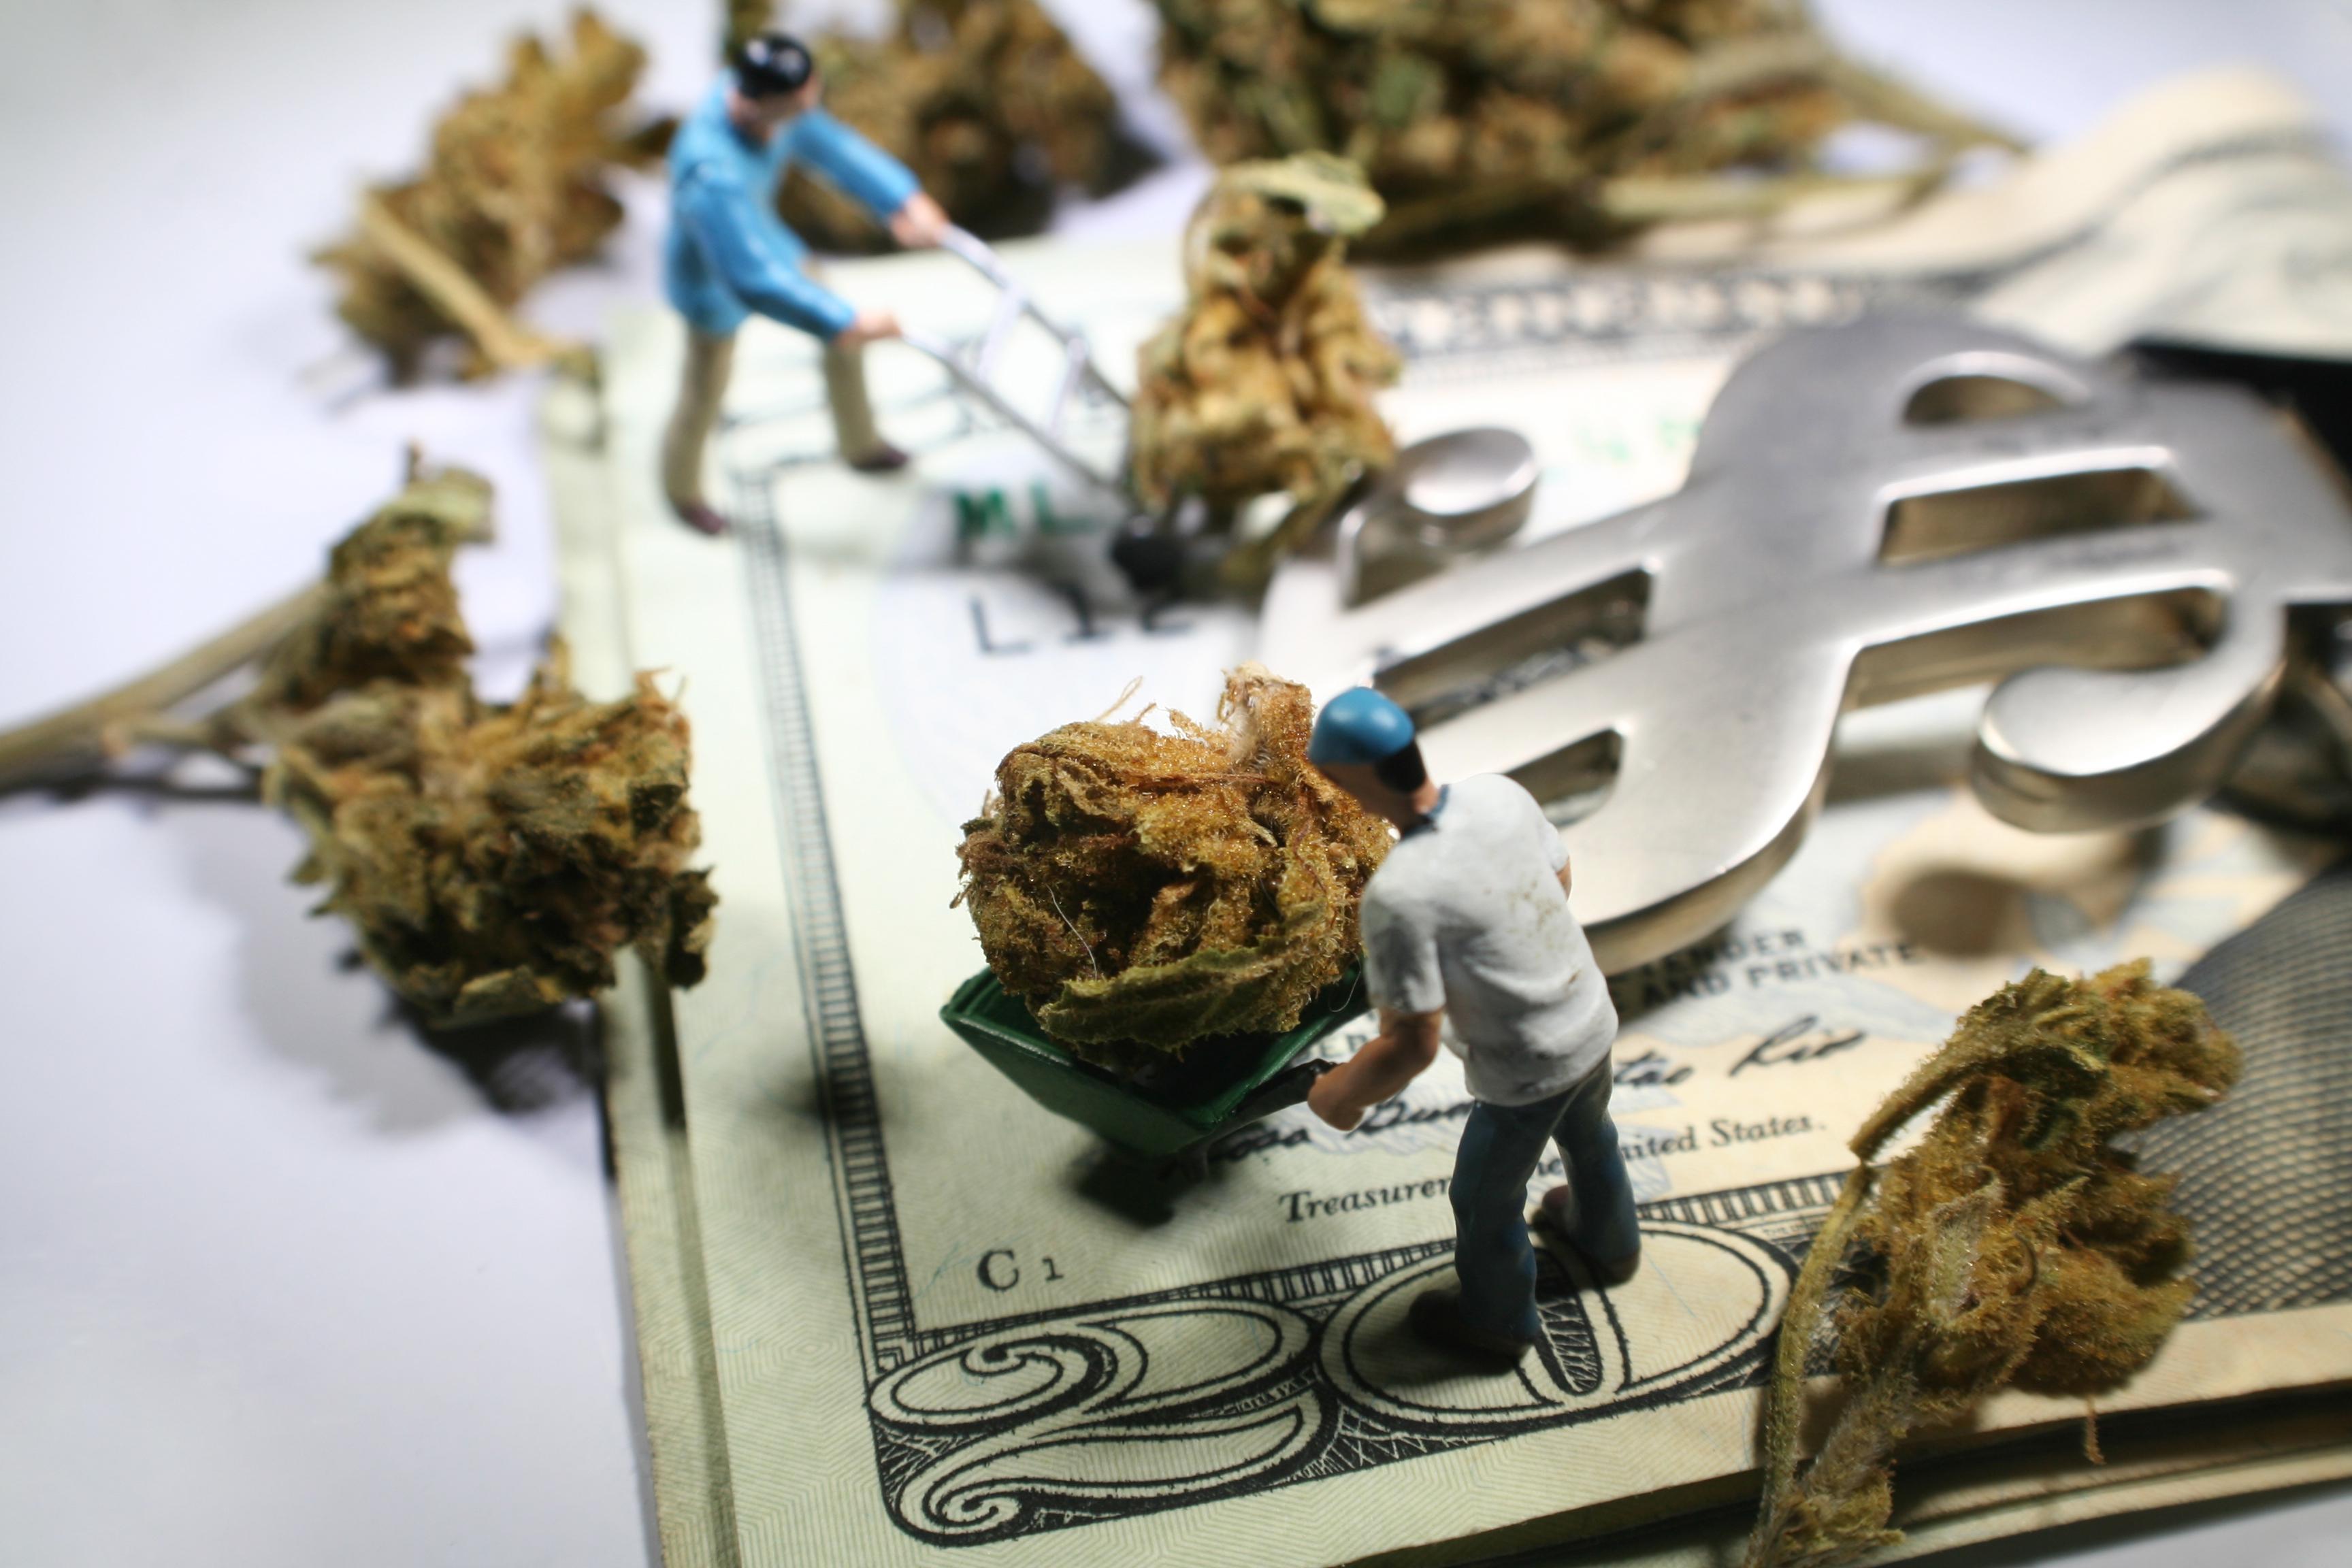 Tiny figures pushing wheelbarrows with marijuana buds on top of $20 bills with a dollar symbol money clip